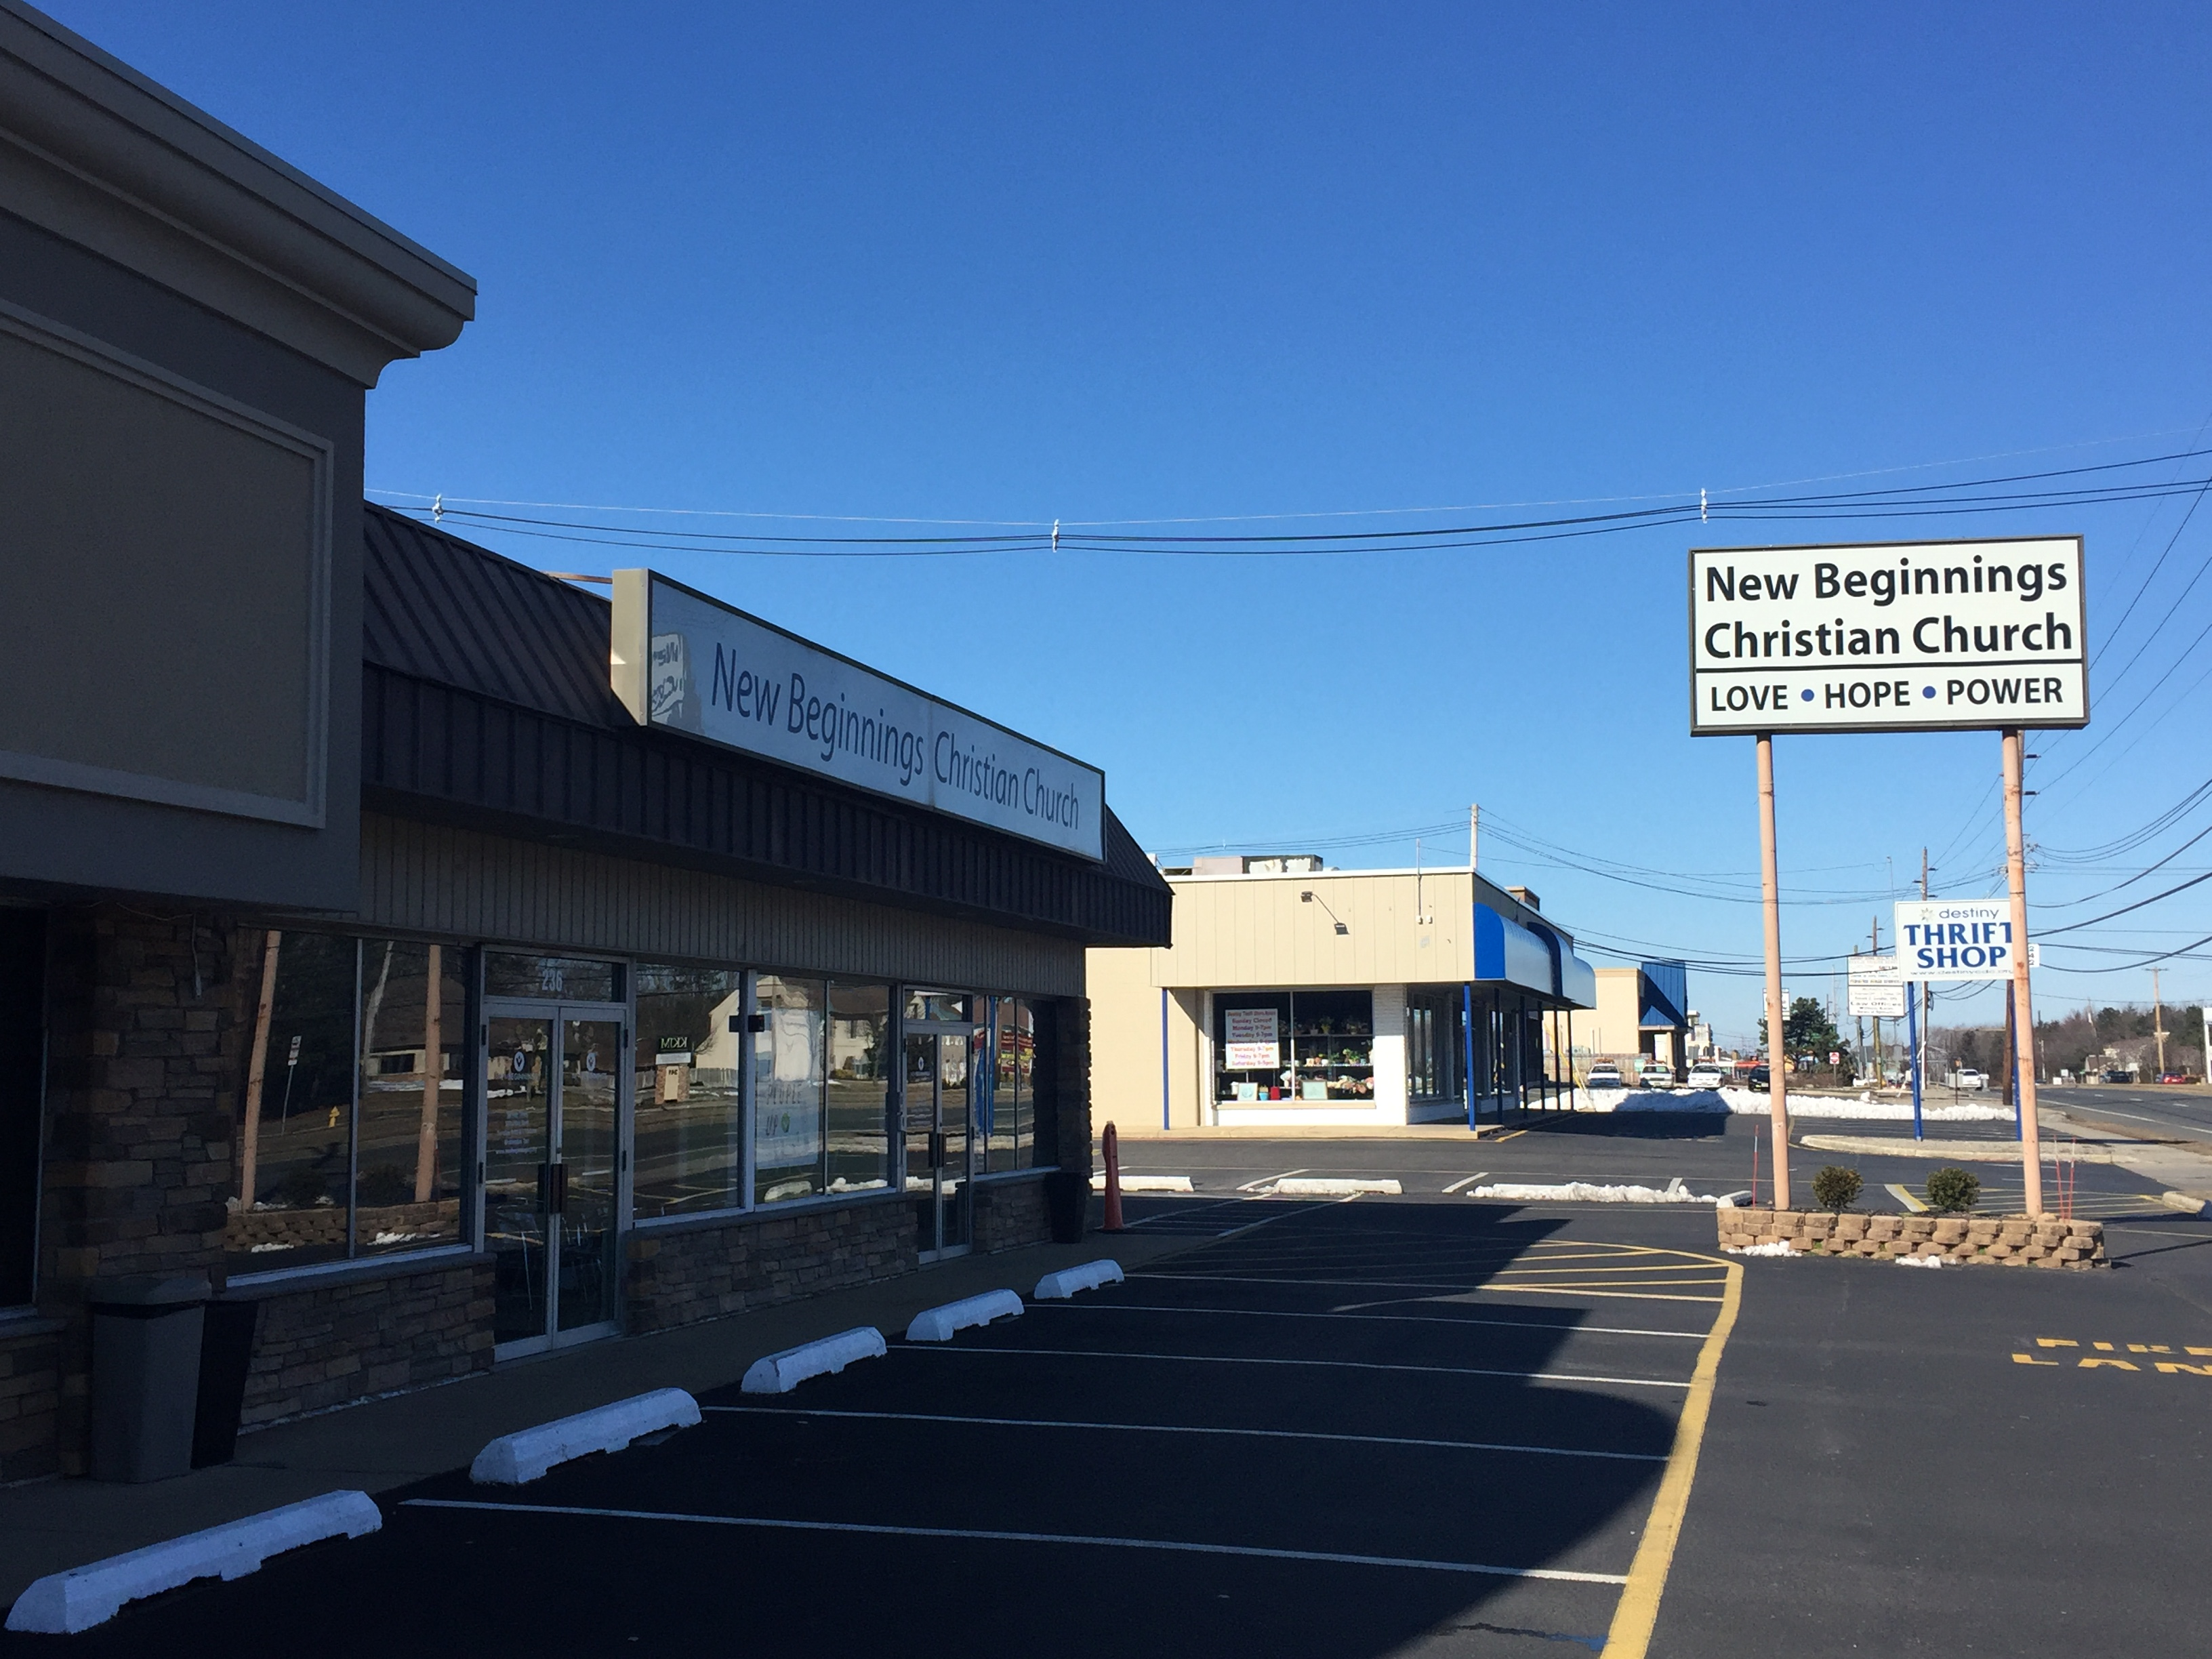 New Beginnings Christian Church, Brick, N.J. (Photo: Daniel Nee)